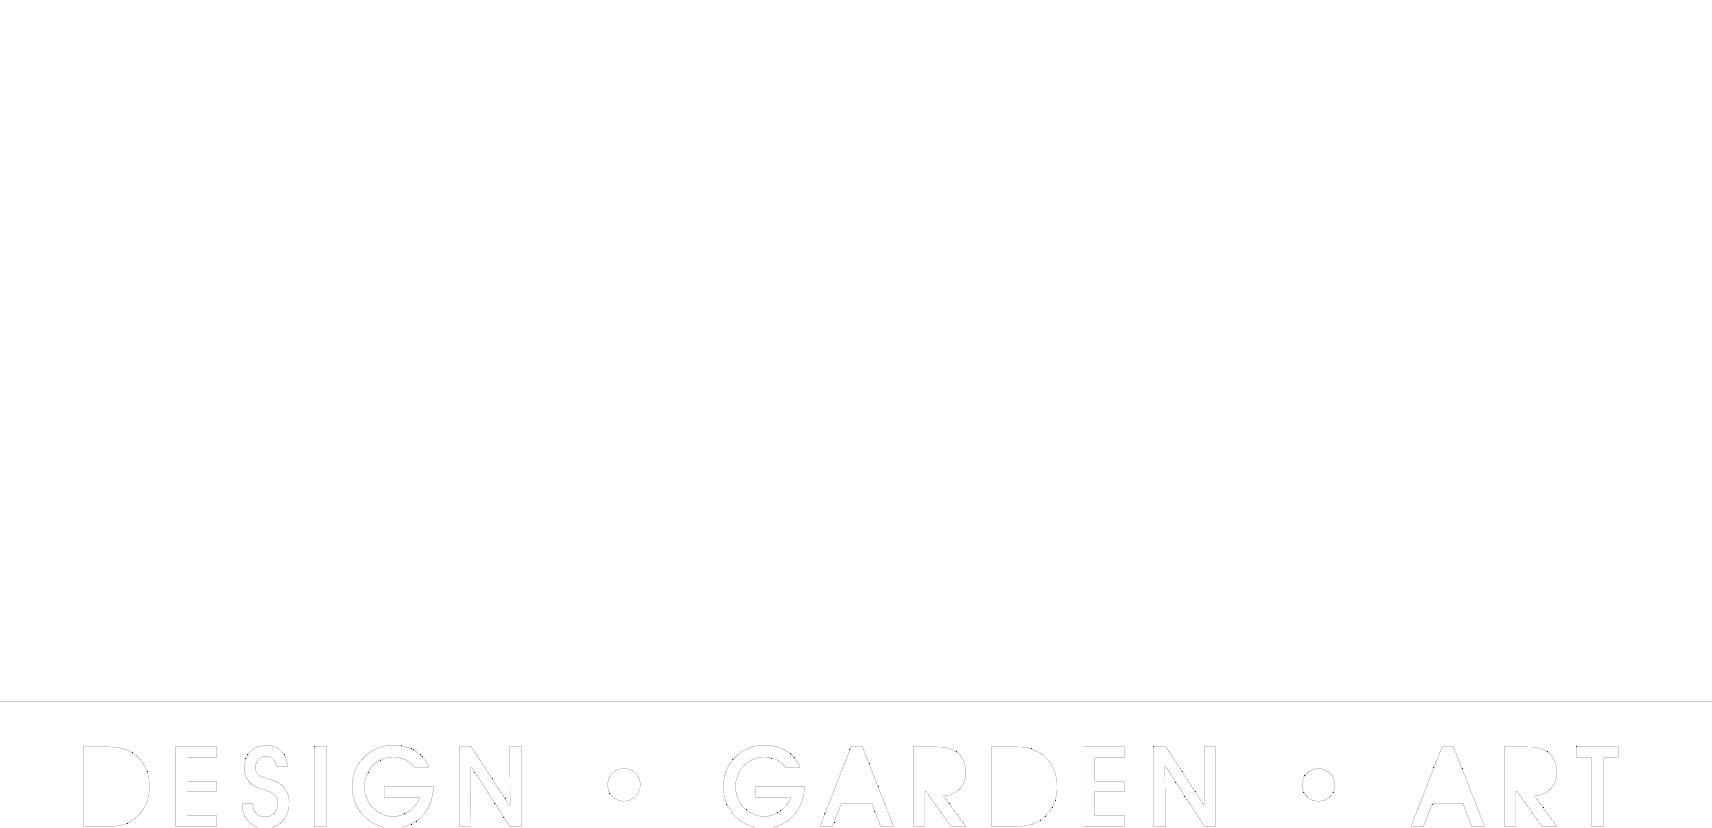 Heritage Oaks Landscaping